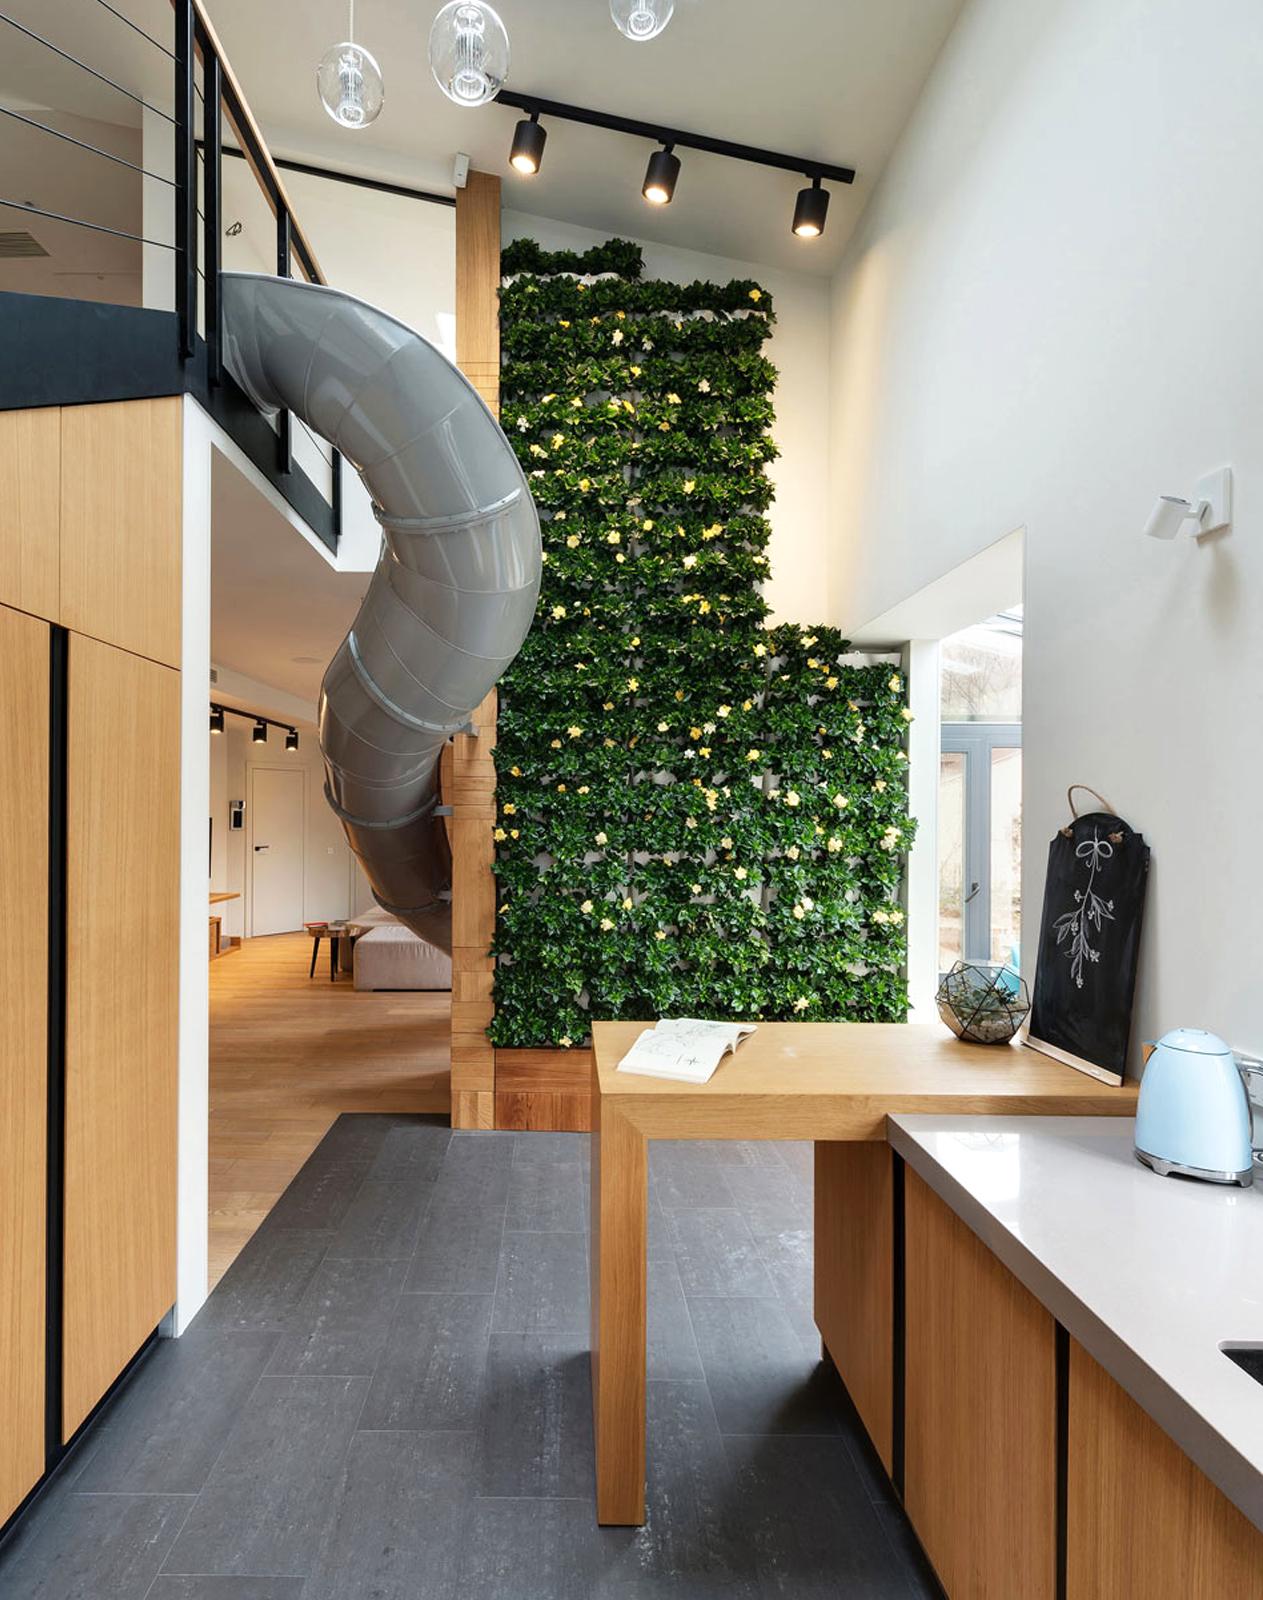 ki-design-studio-depa-resbaladilla-casa-7